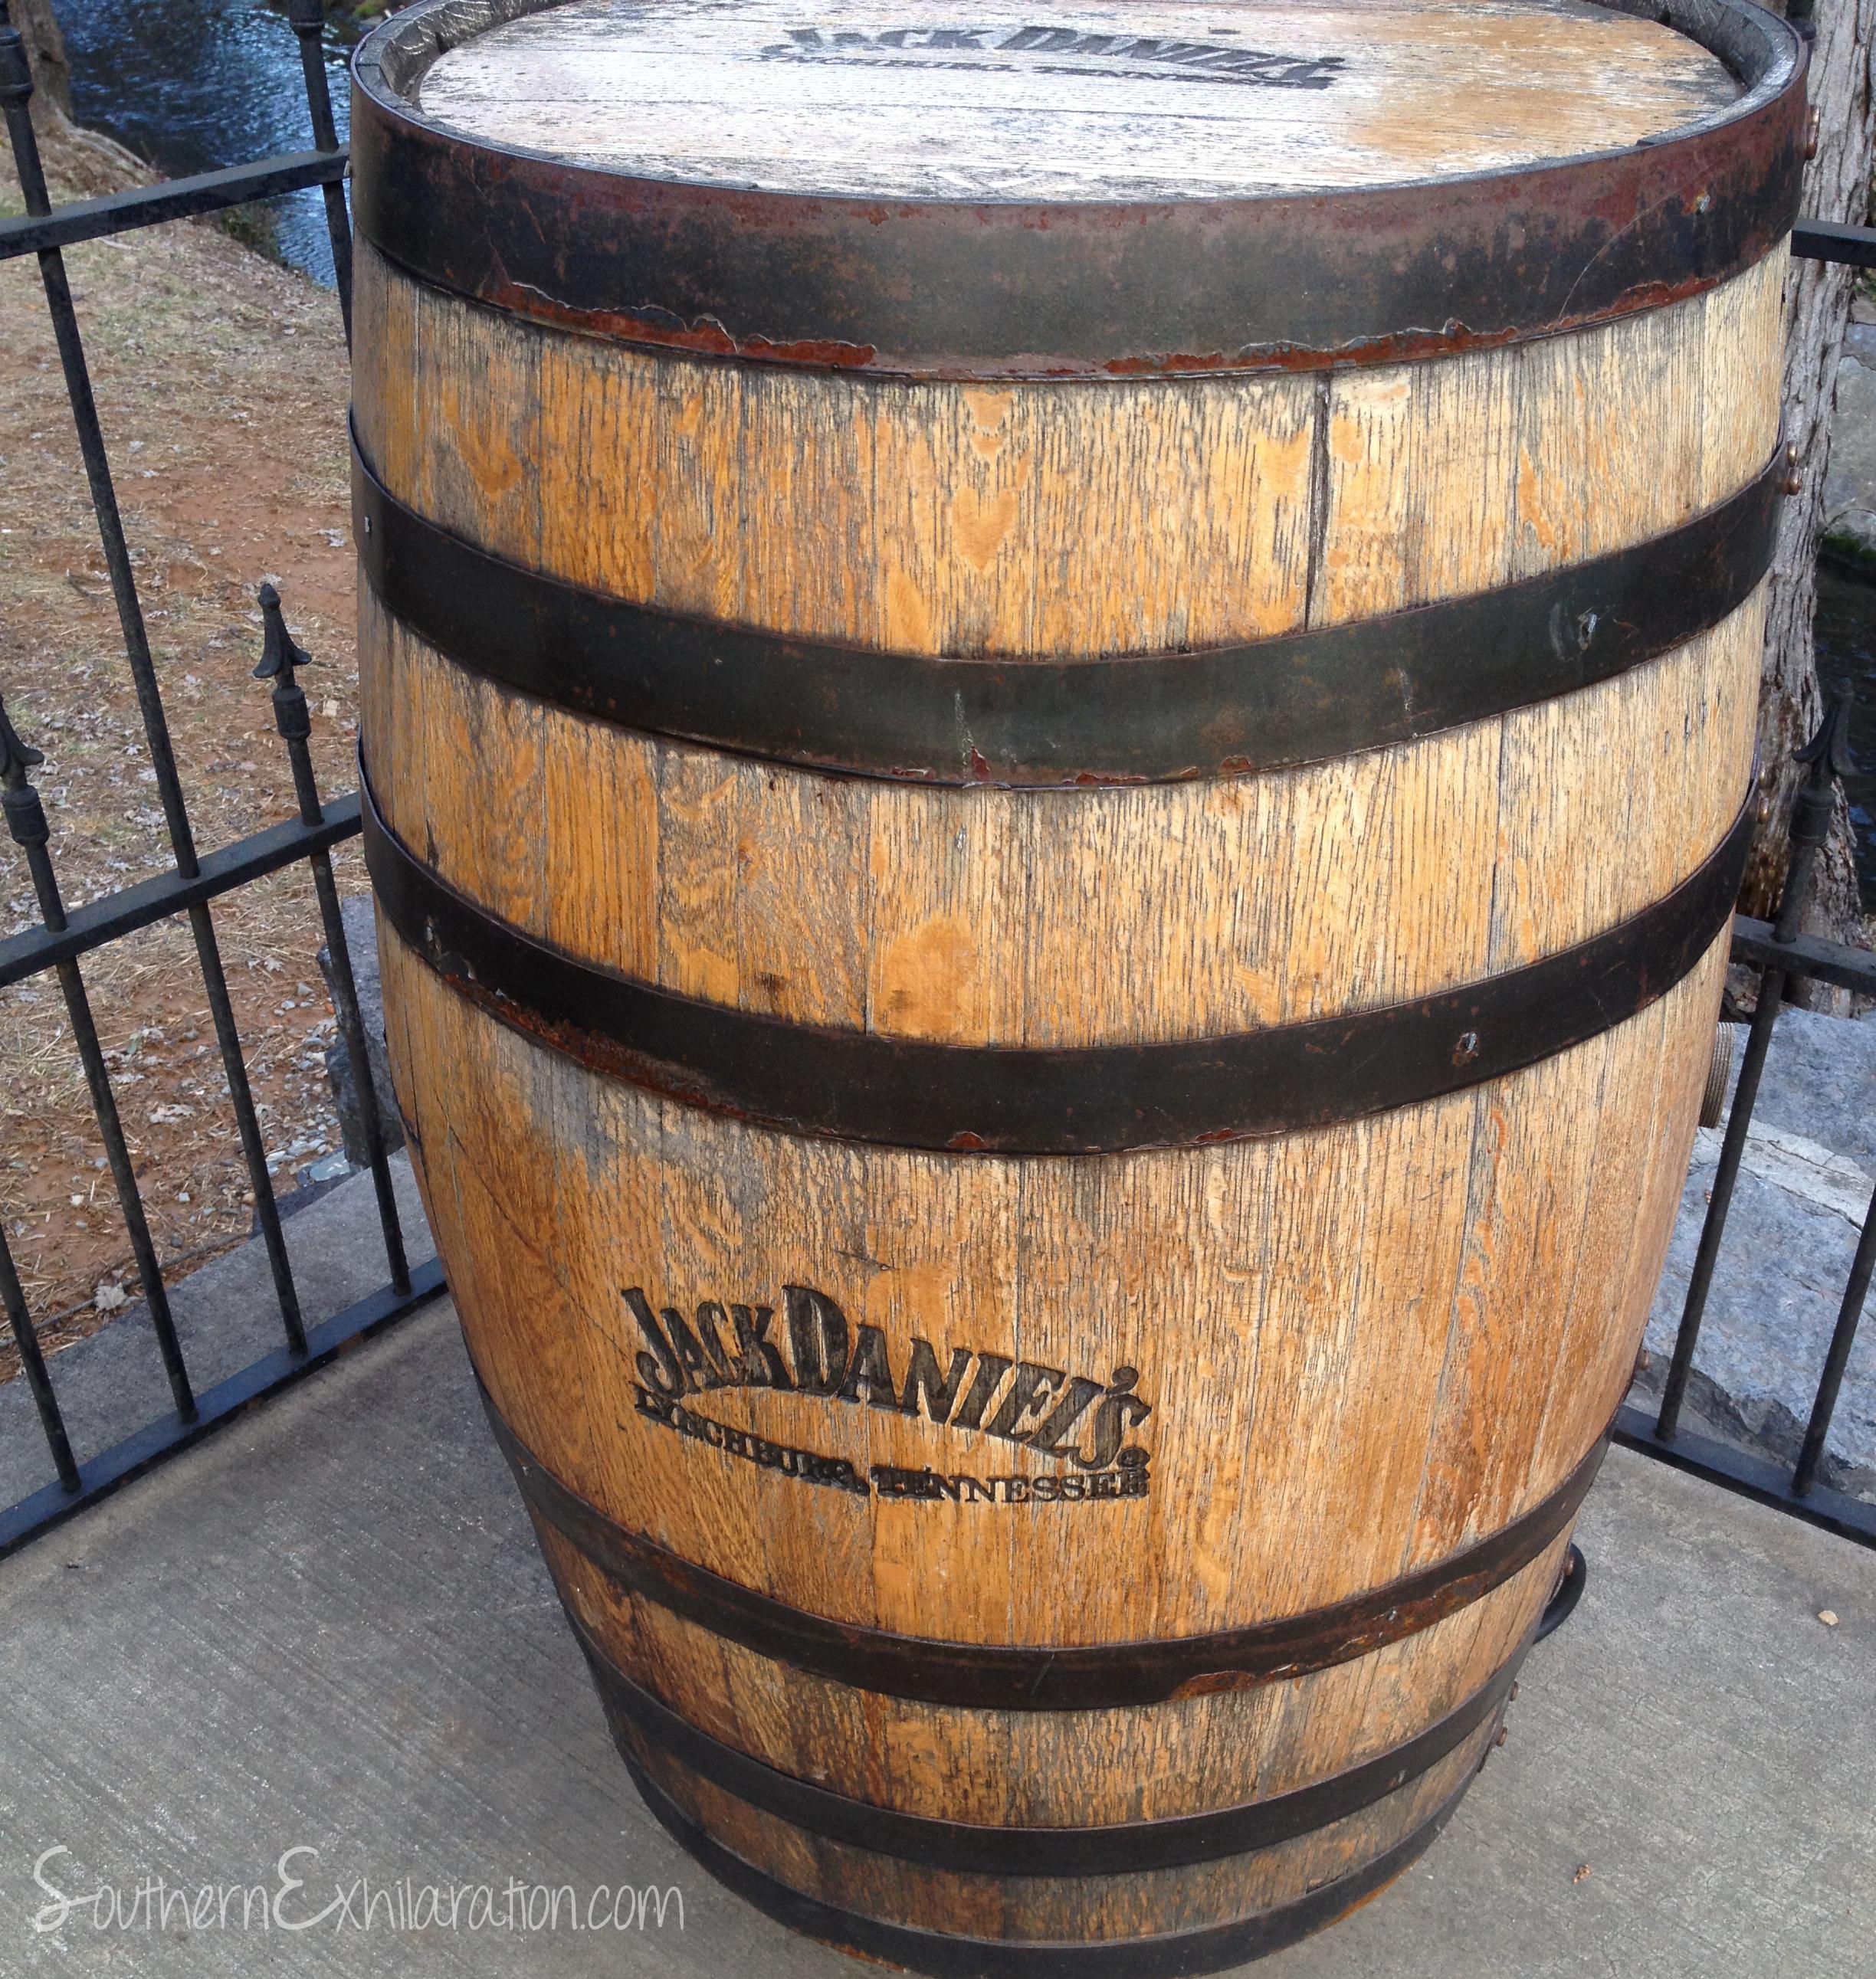 Jack Daniel's Distillery | Lynchburg, TN